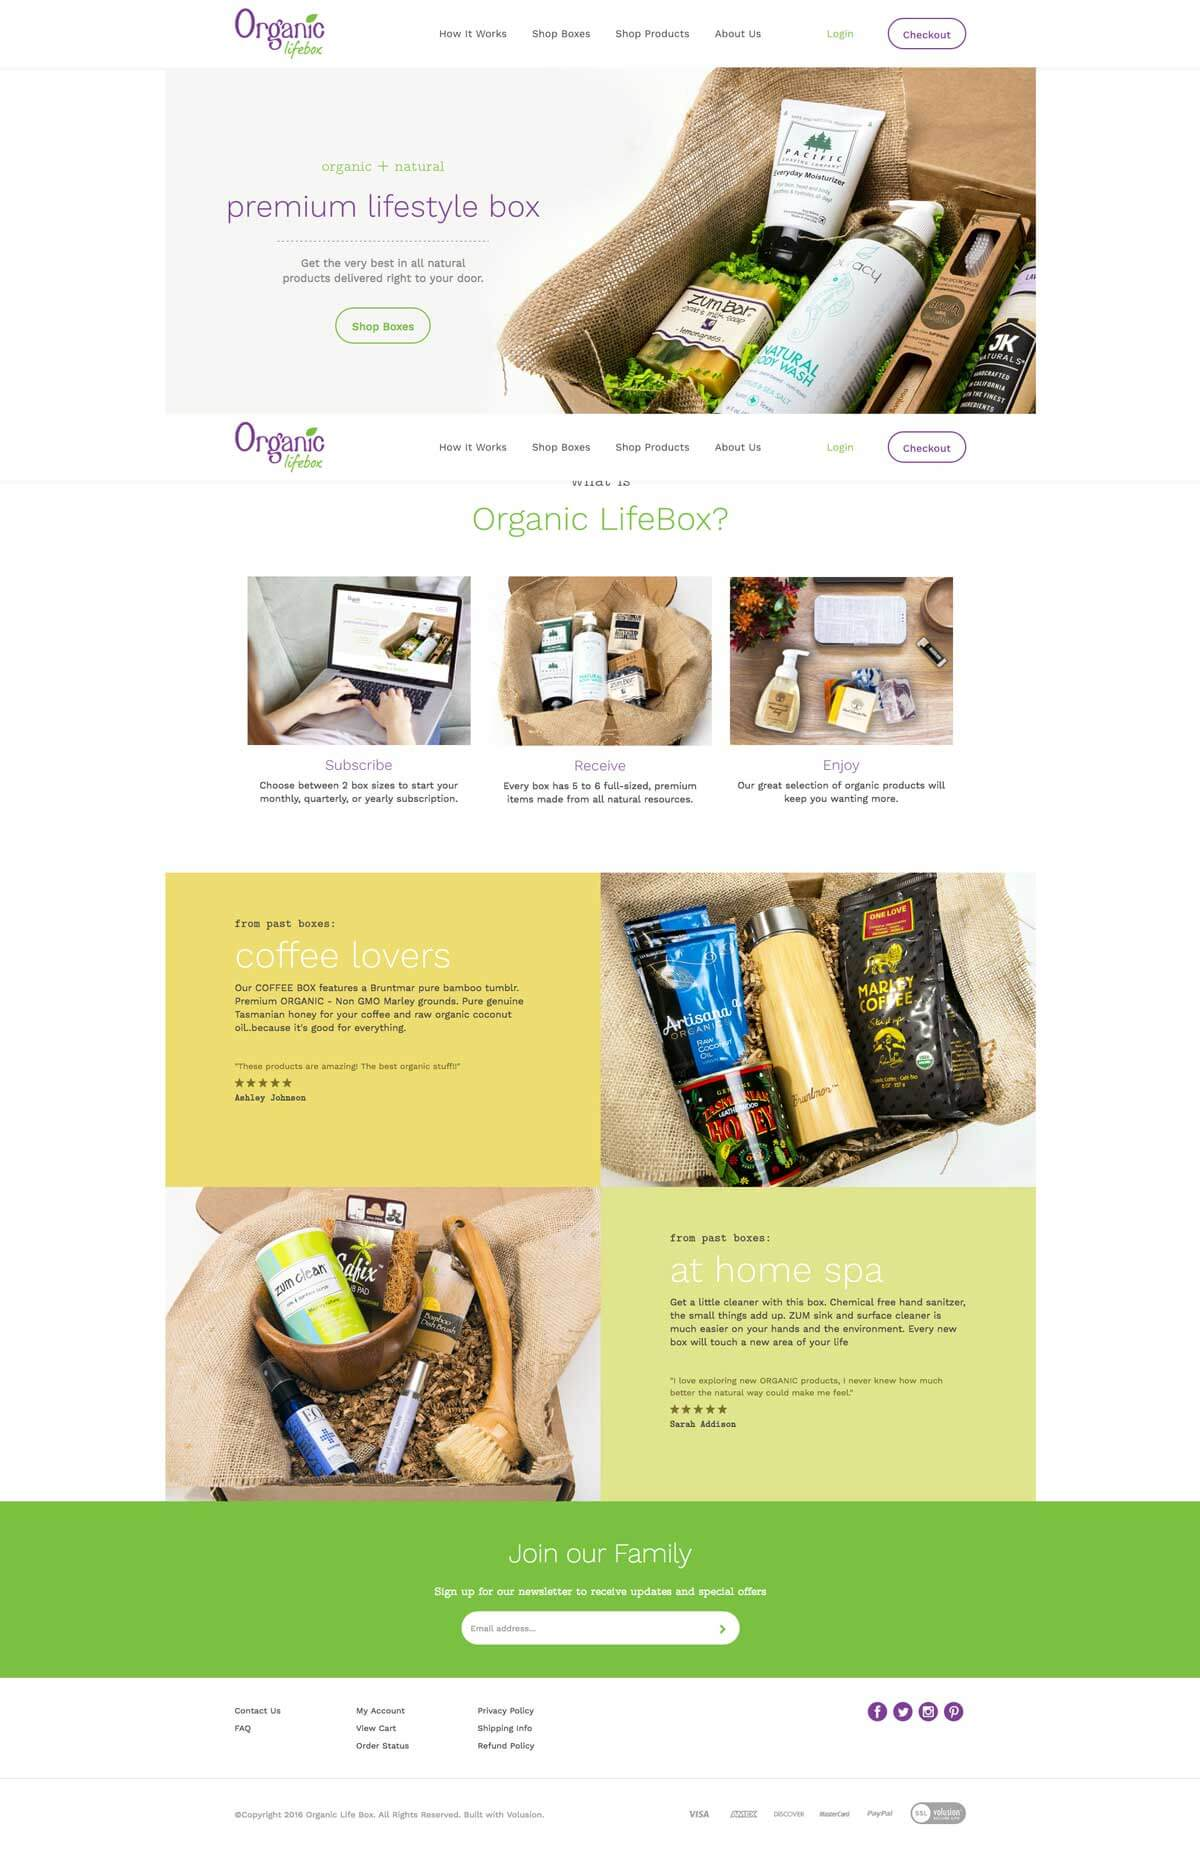 Organic LifeBox